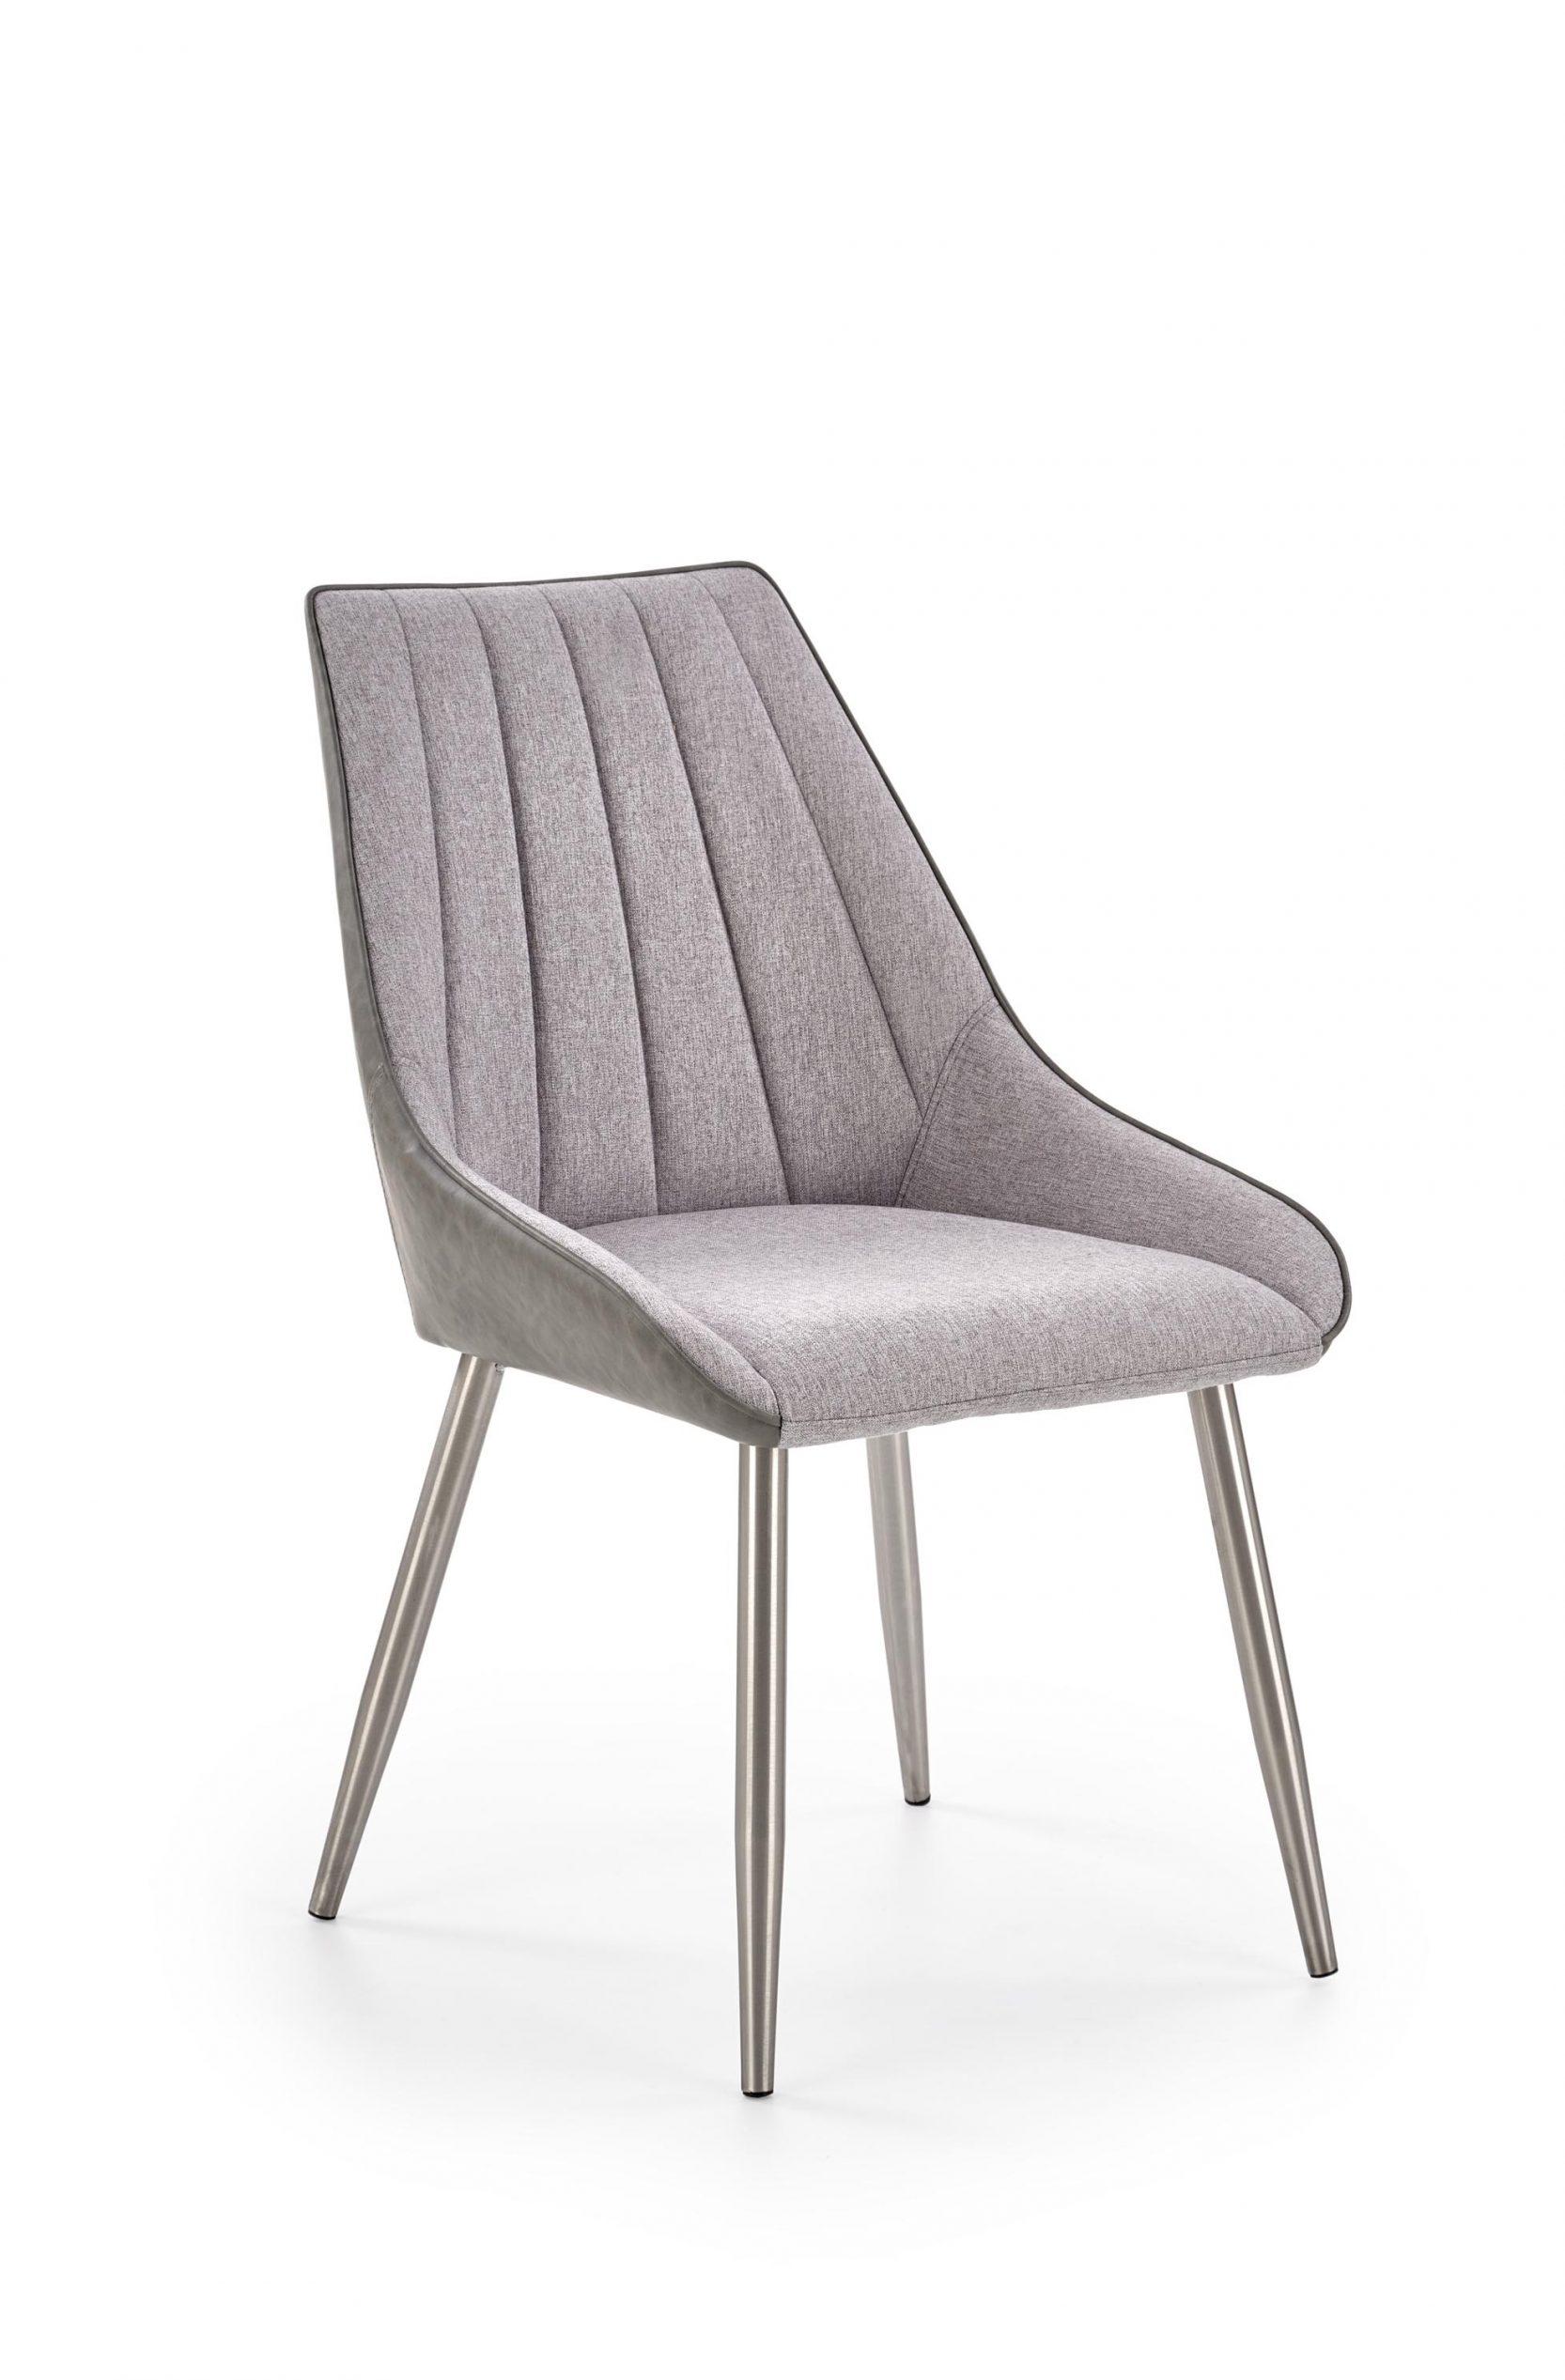 Scaun tapitat cu stofa si piele ecologica, cu picioare metalice K311 Gri inchis / Gri deschis, l54xA57xH88 cm imagine